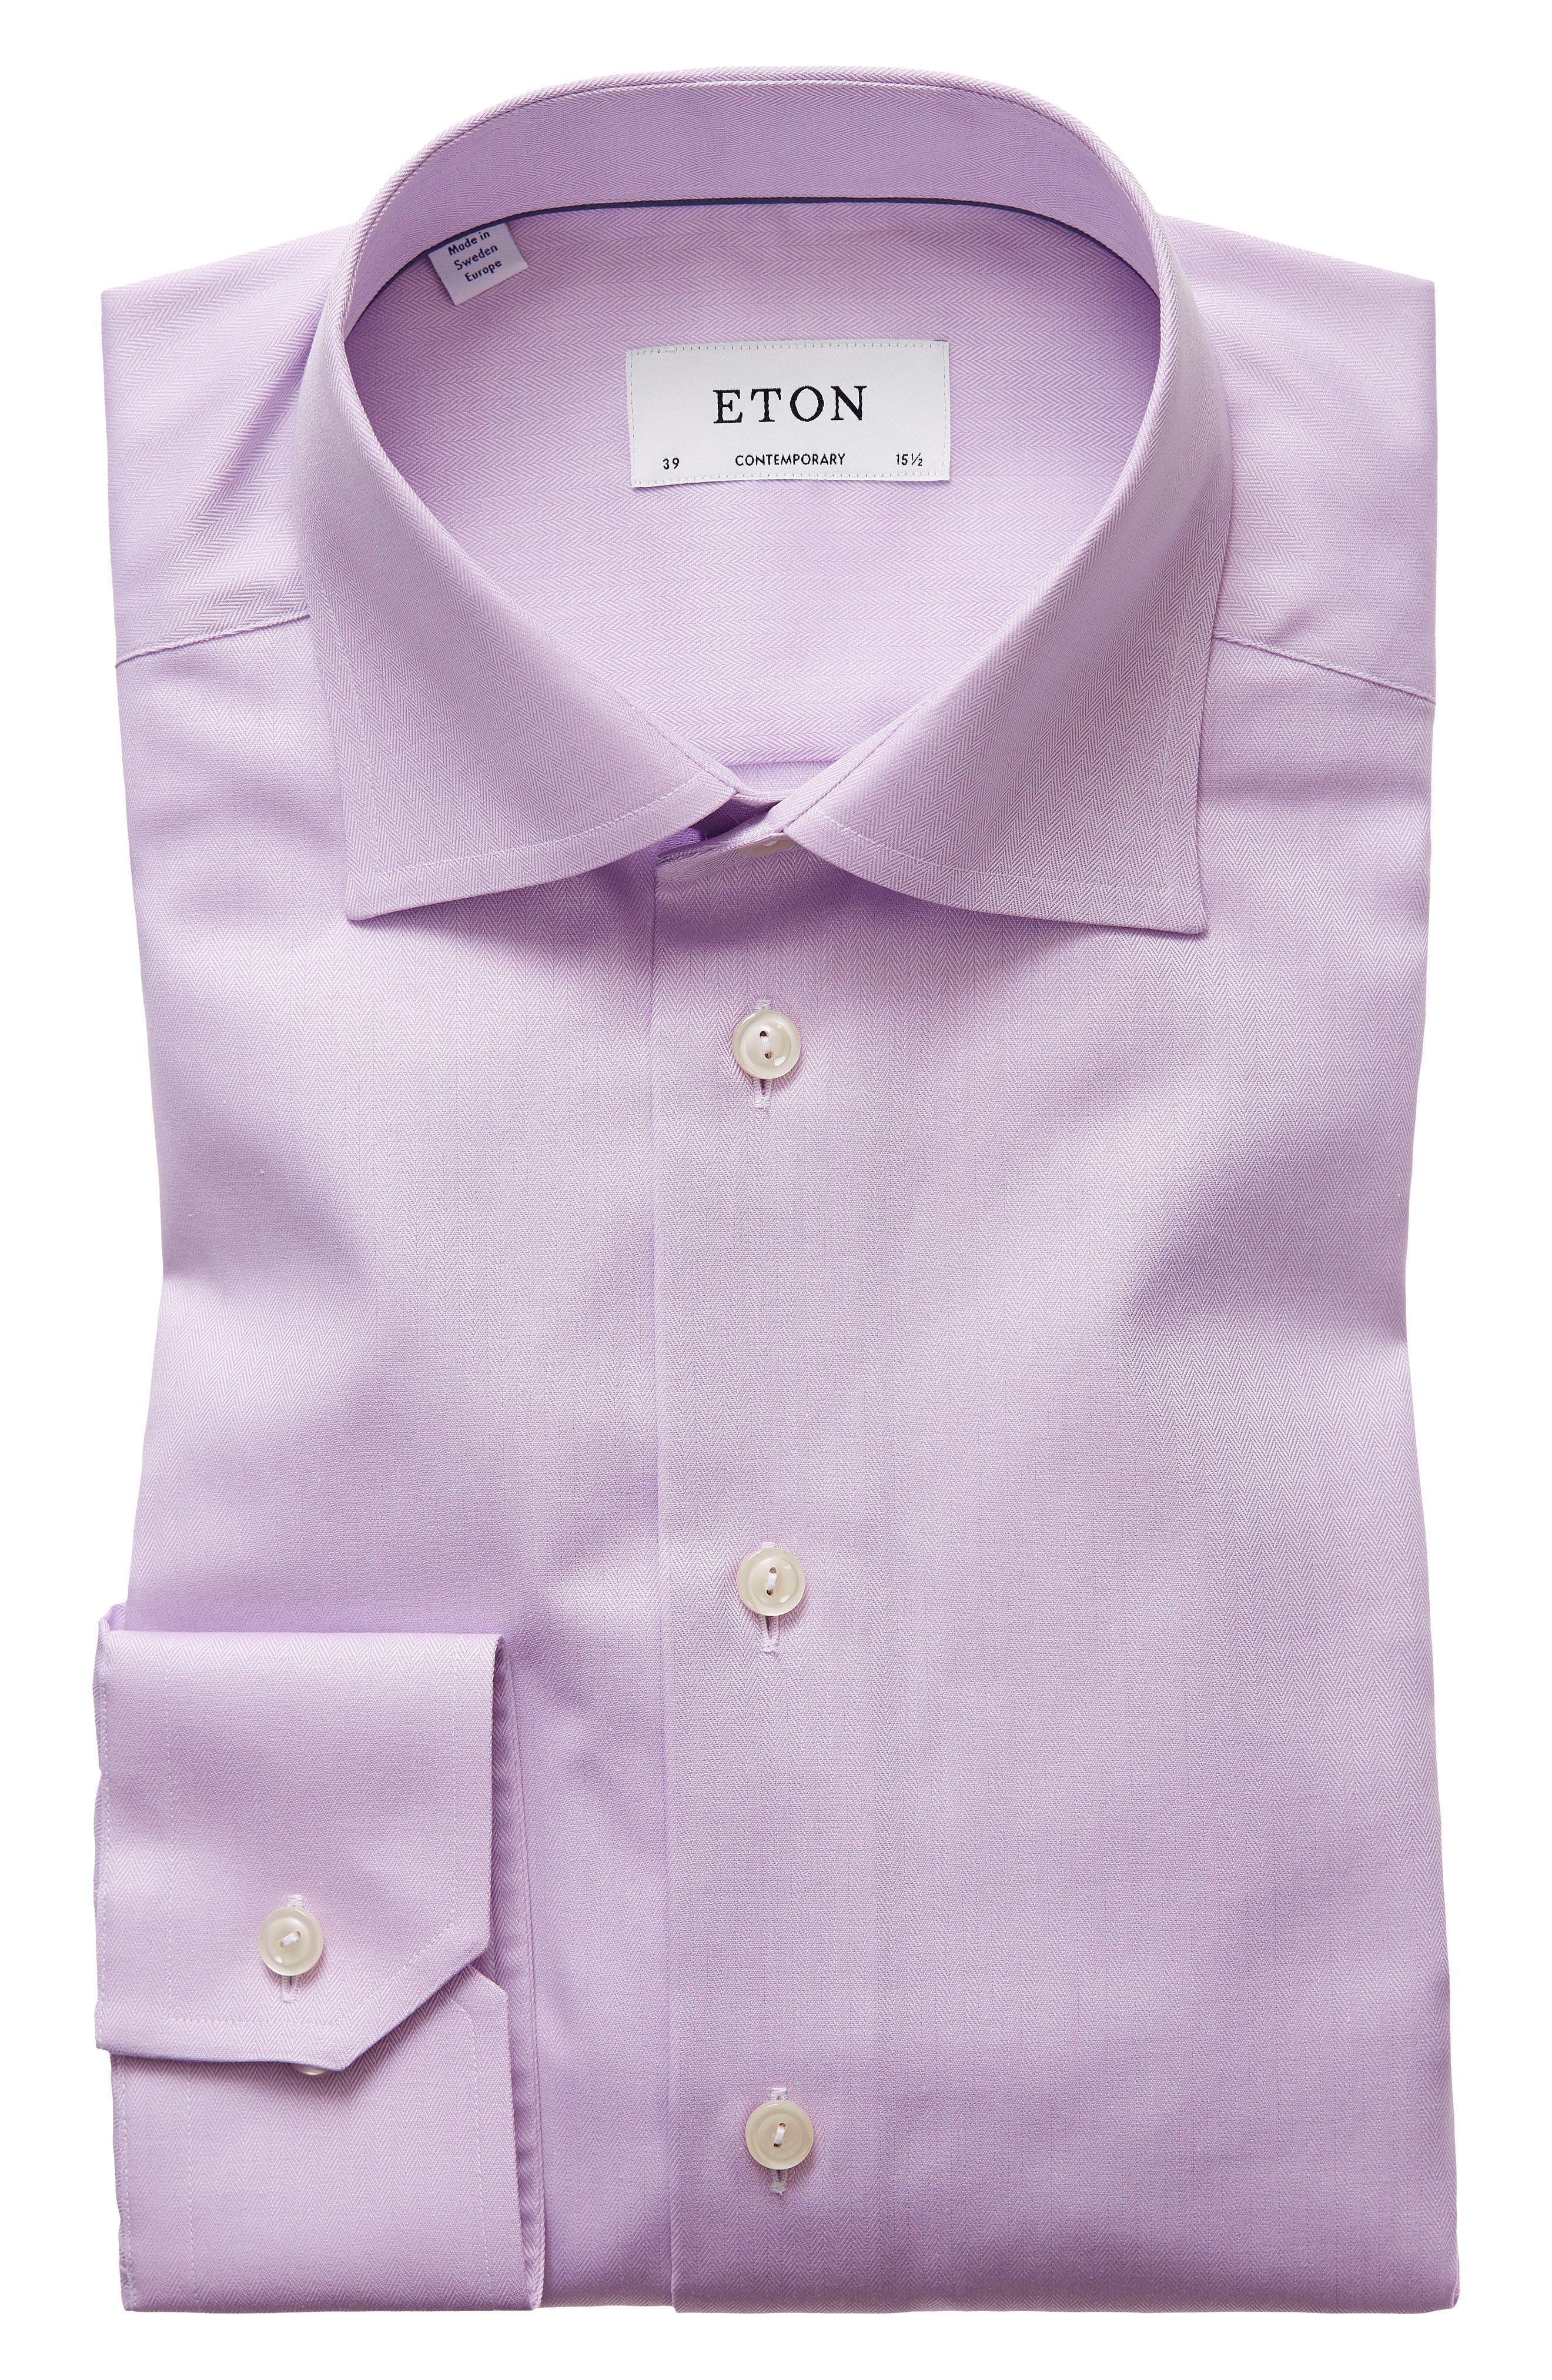 Main Image - Eton Contemporary Fit Herringbone Dress Shirt